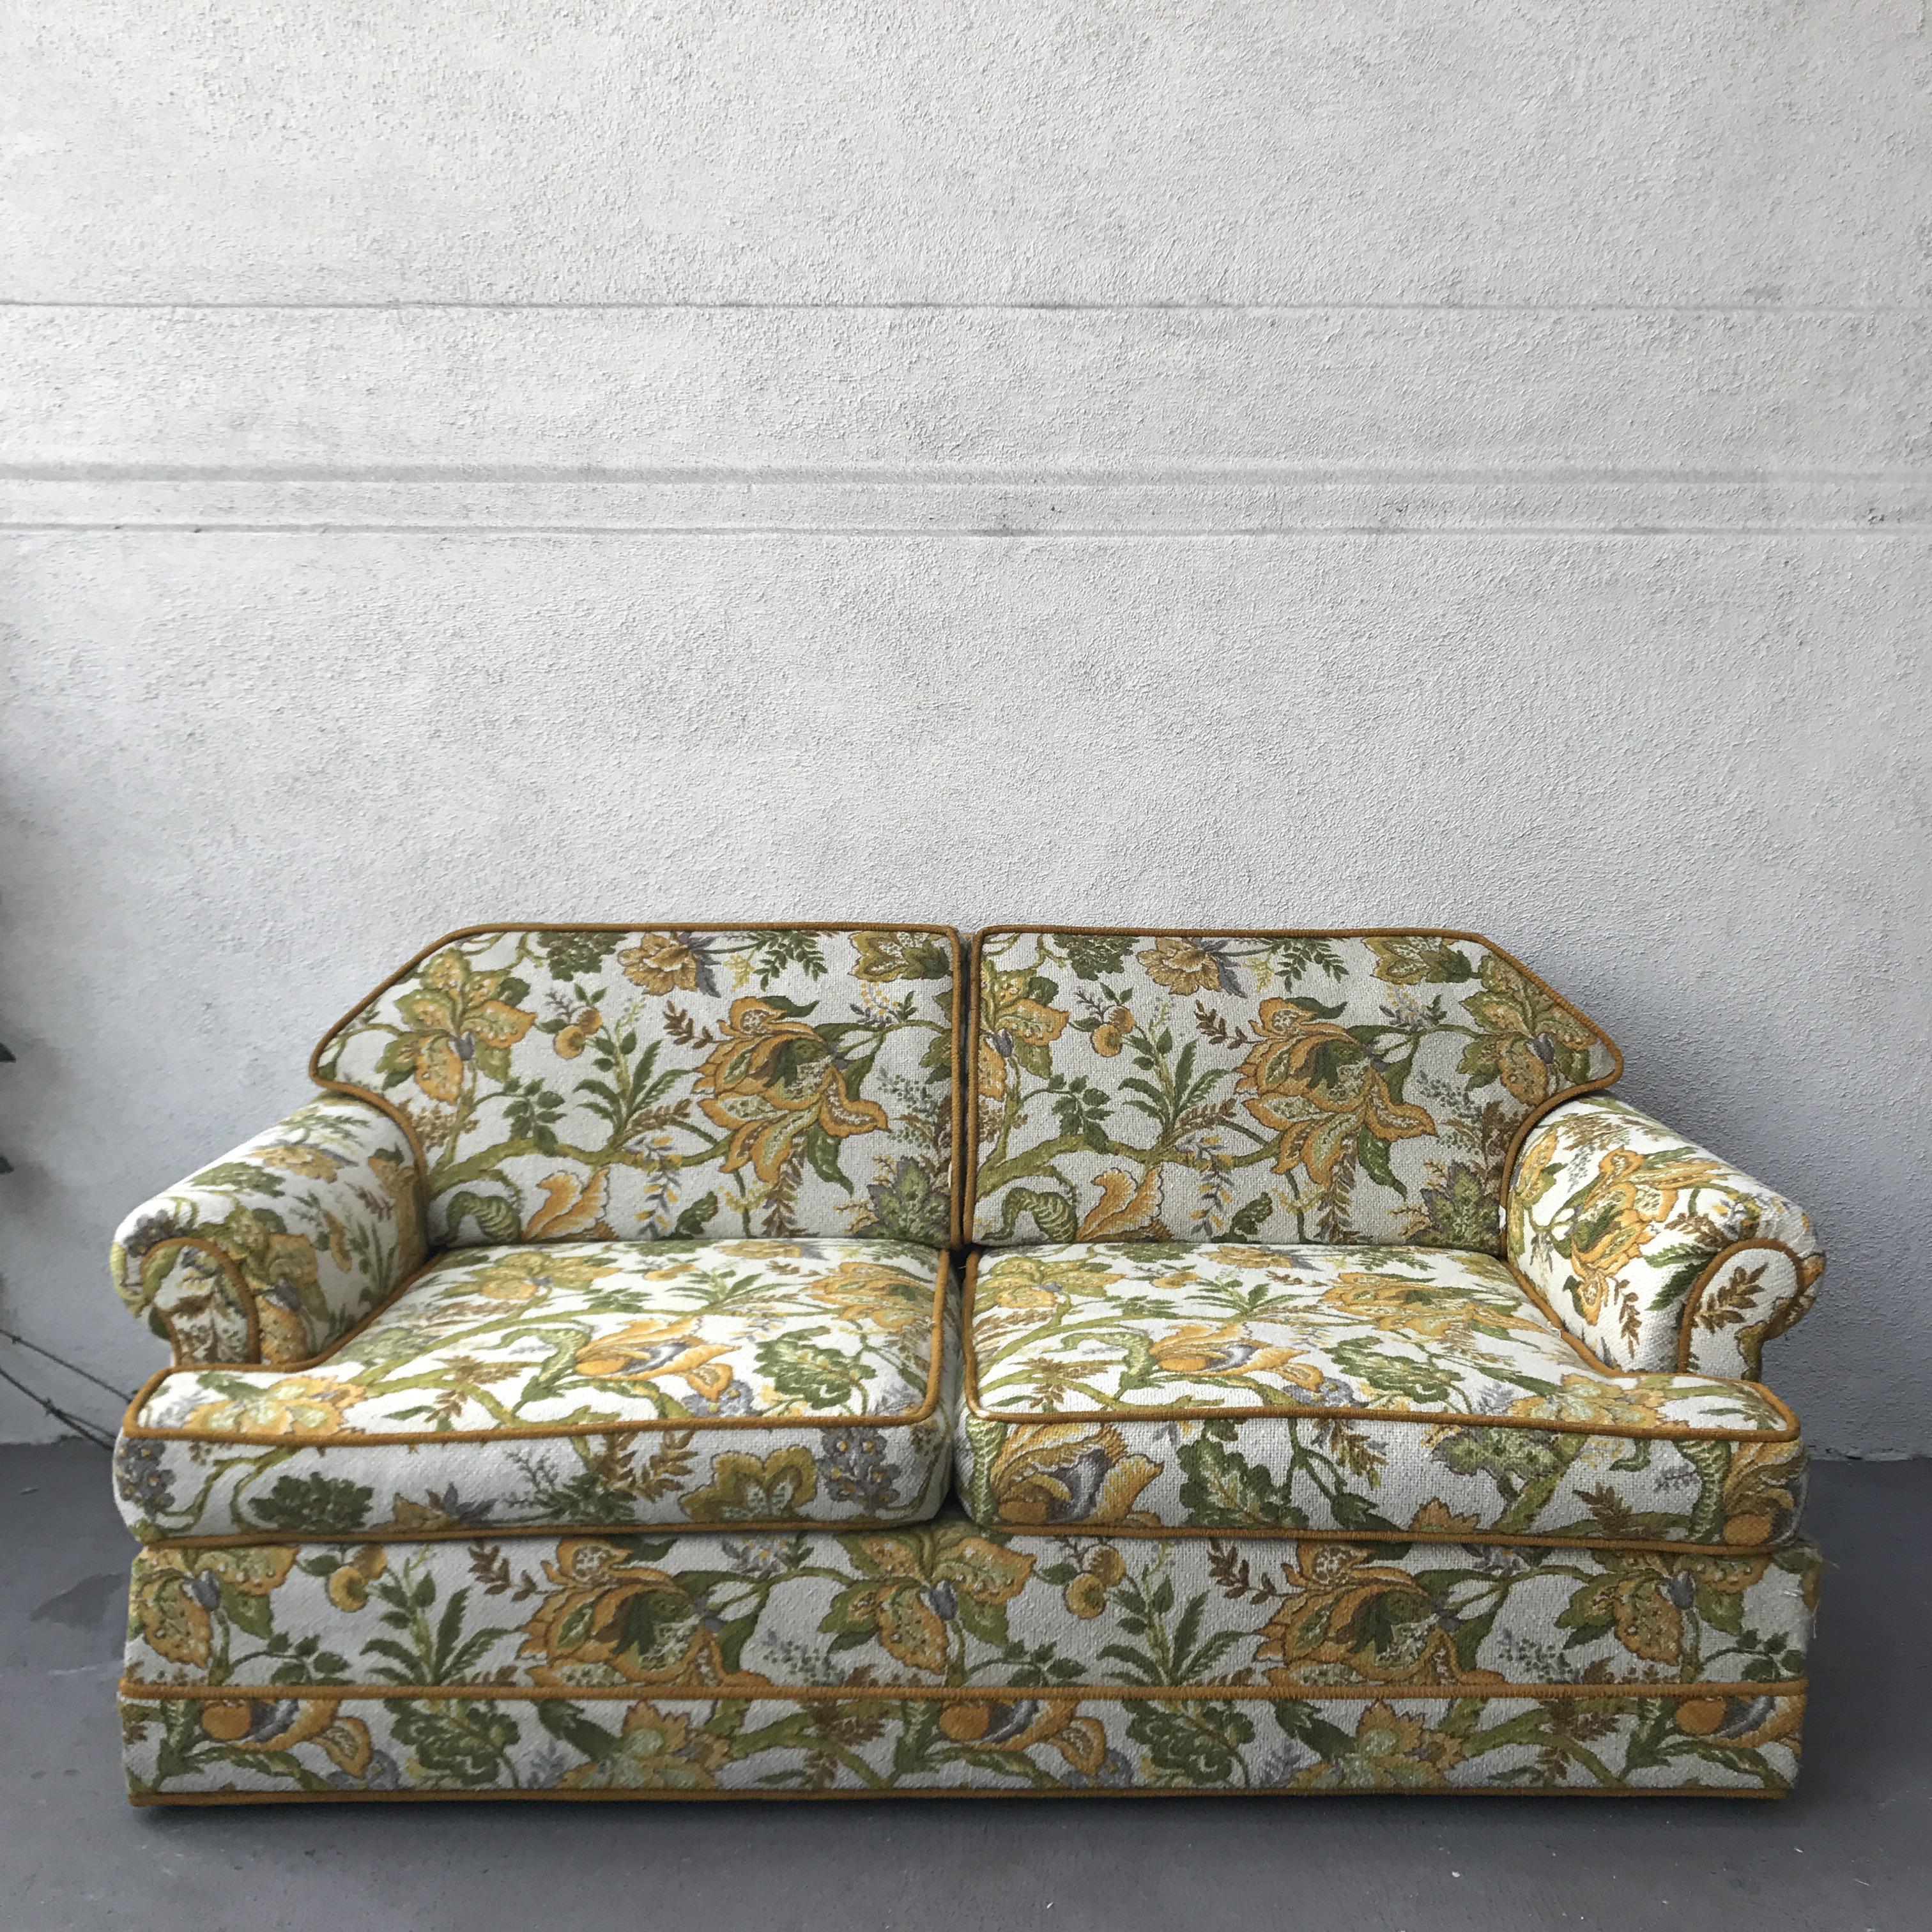 Vintage Mid Century Modern Upholstered Floral Sofa   Image 2 Of 8